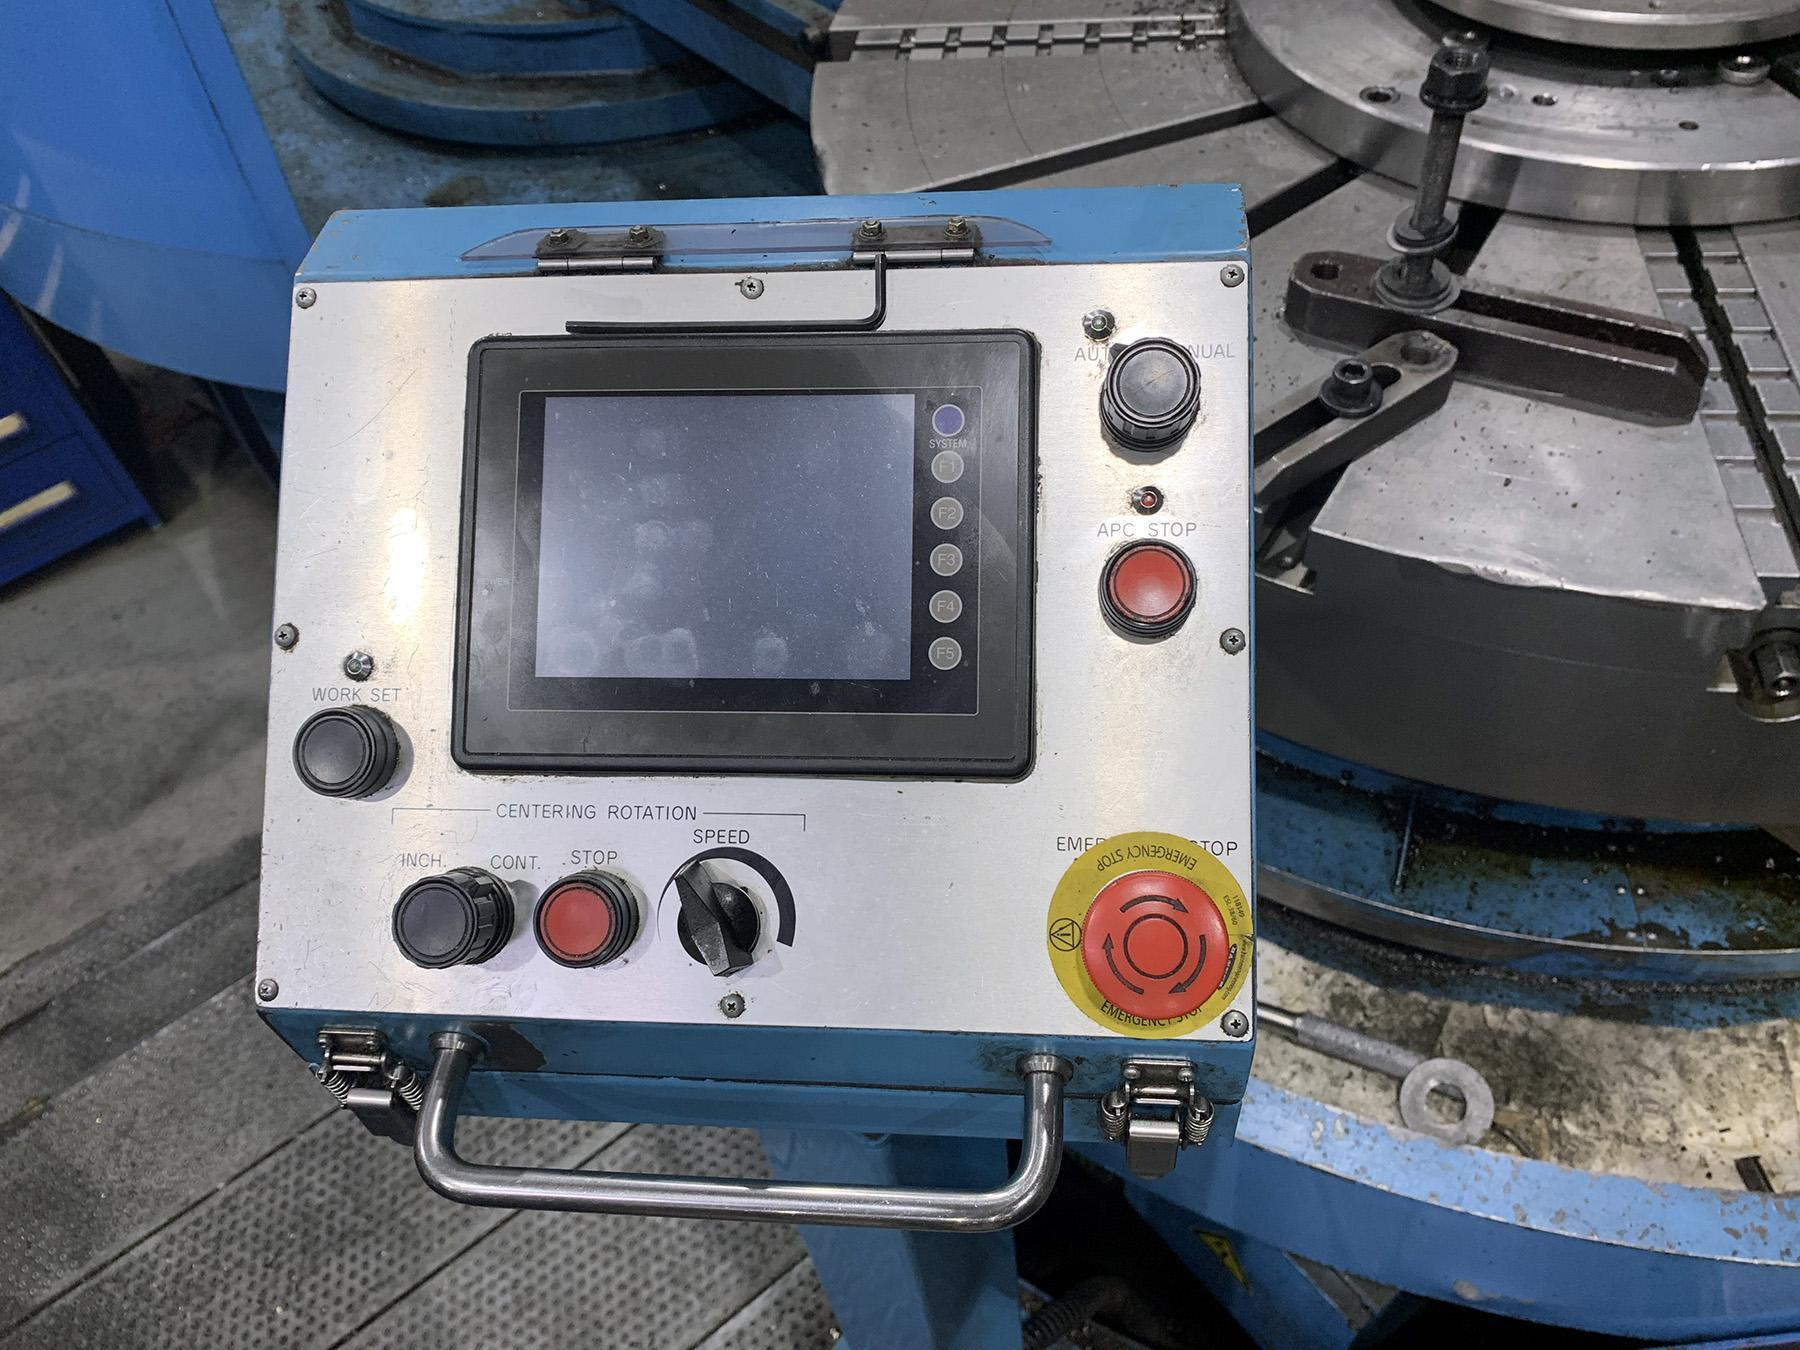 USED, O-M VTLEX 1600M DUAL PALLET 3 AXIS CNC VERTICAL MACHINING CENTER